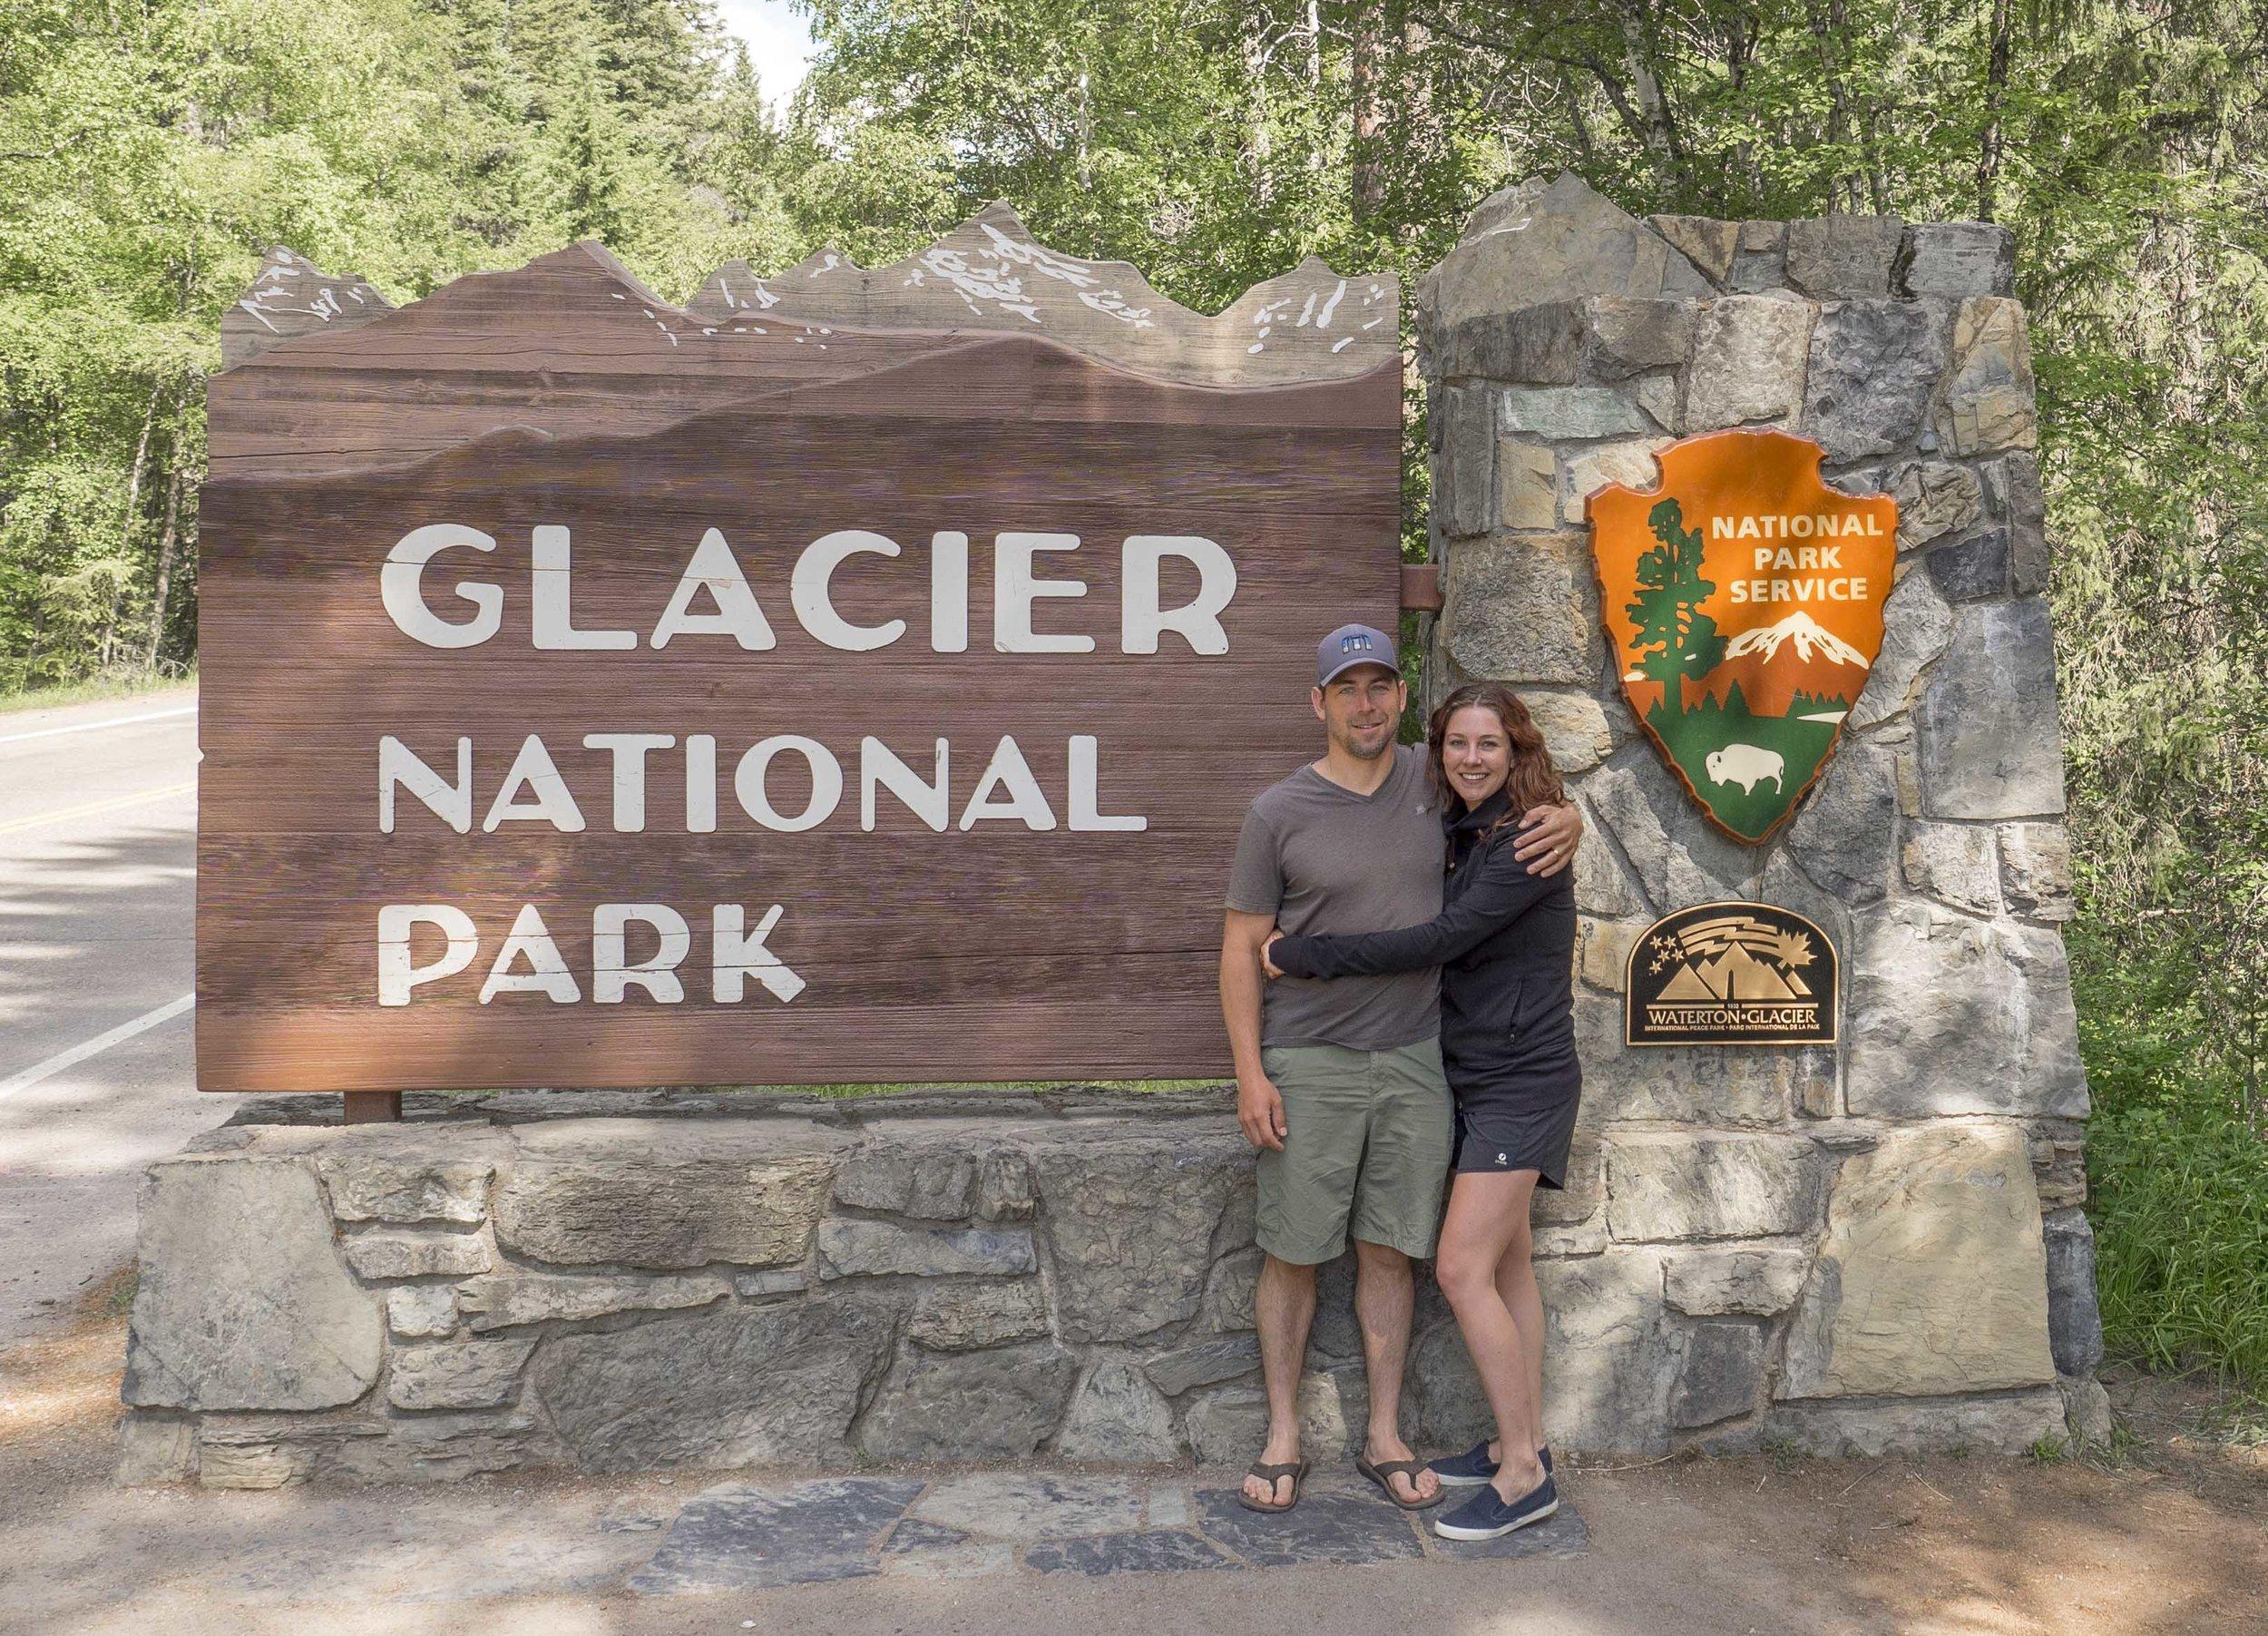 national_park_sign.jpg